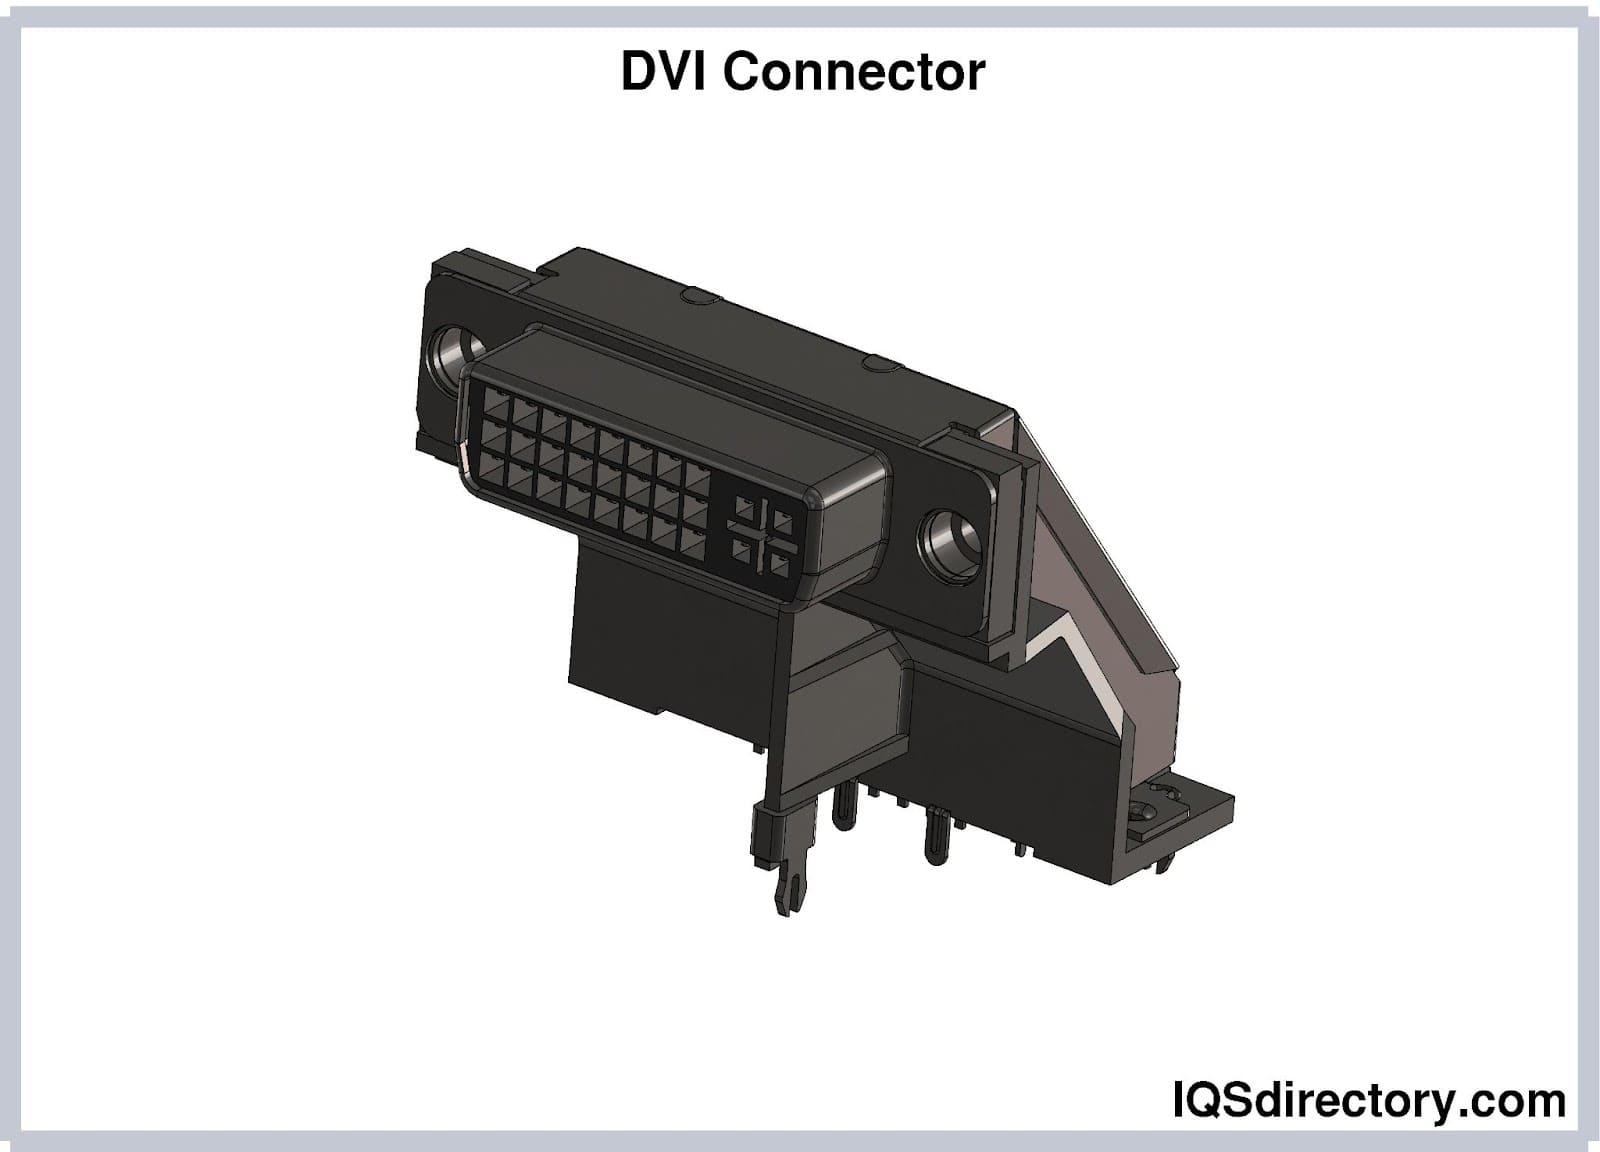 DVI Connector